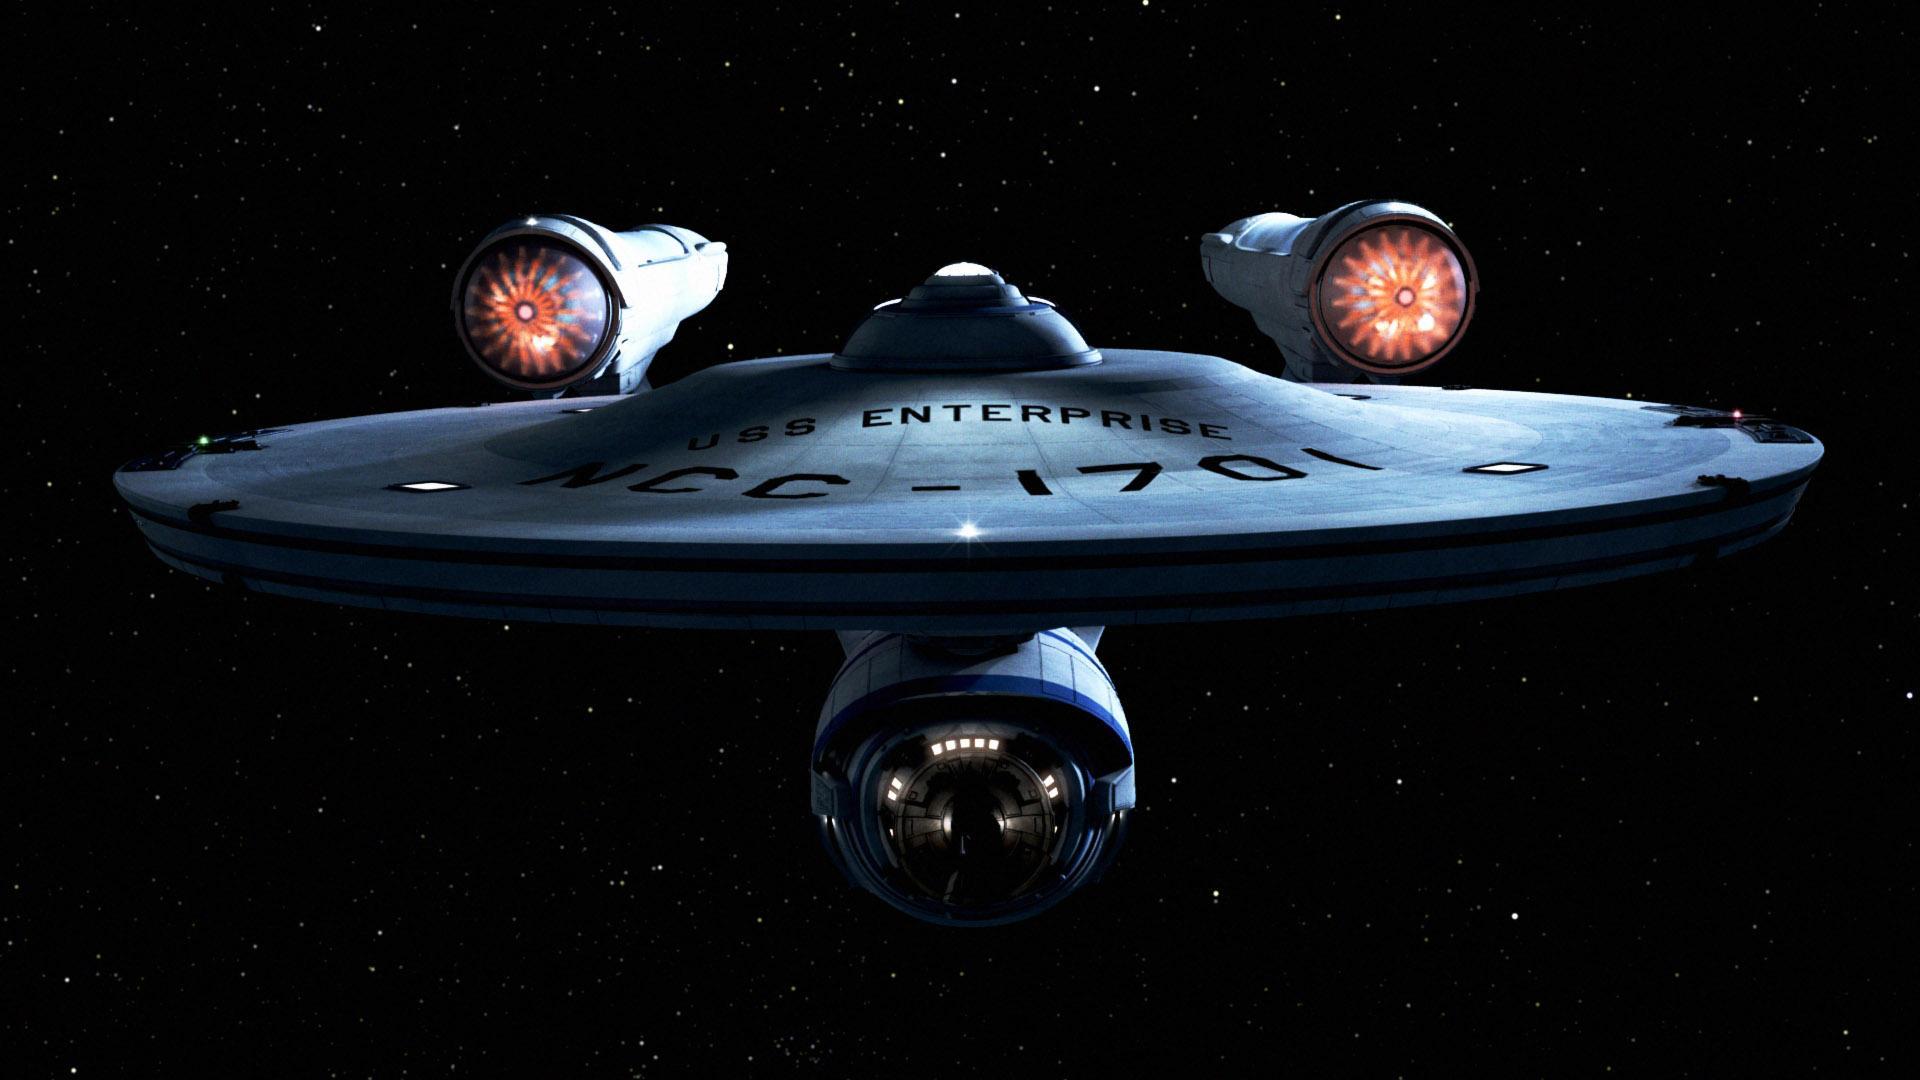 Star Trek Wallpapers 1920x1080 Group 96